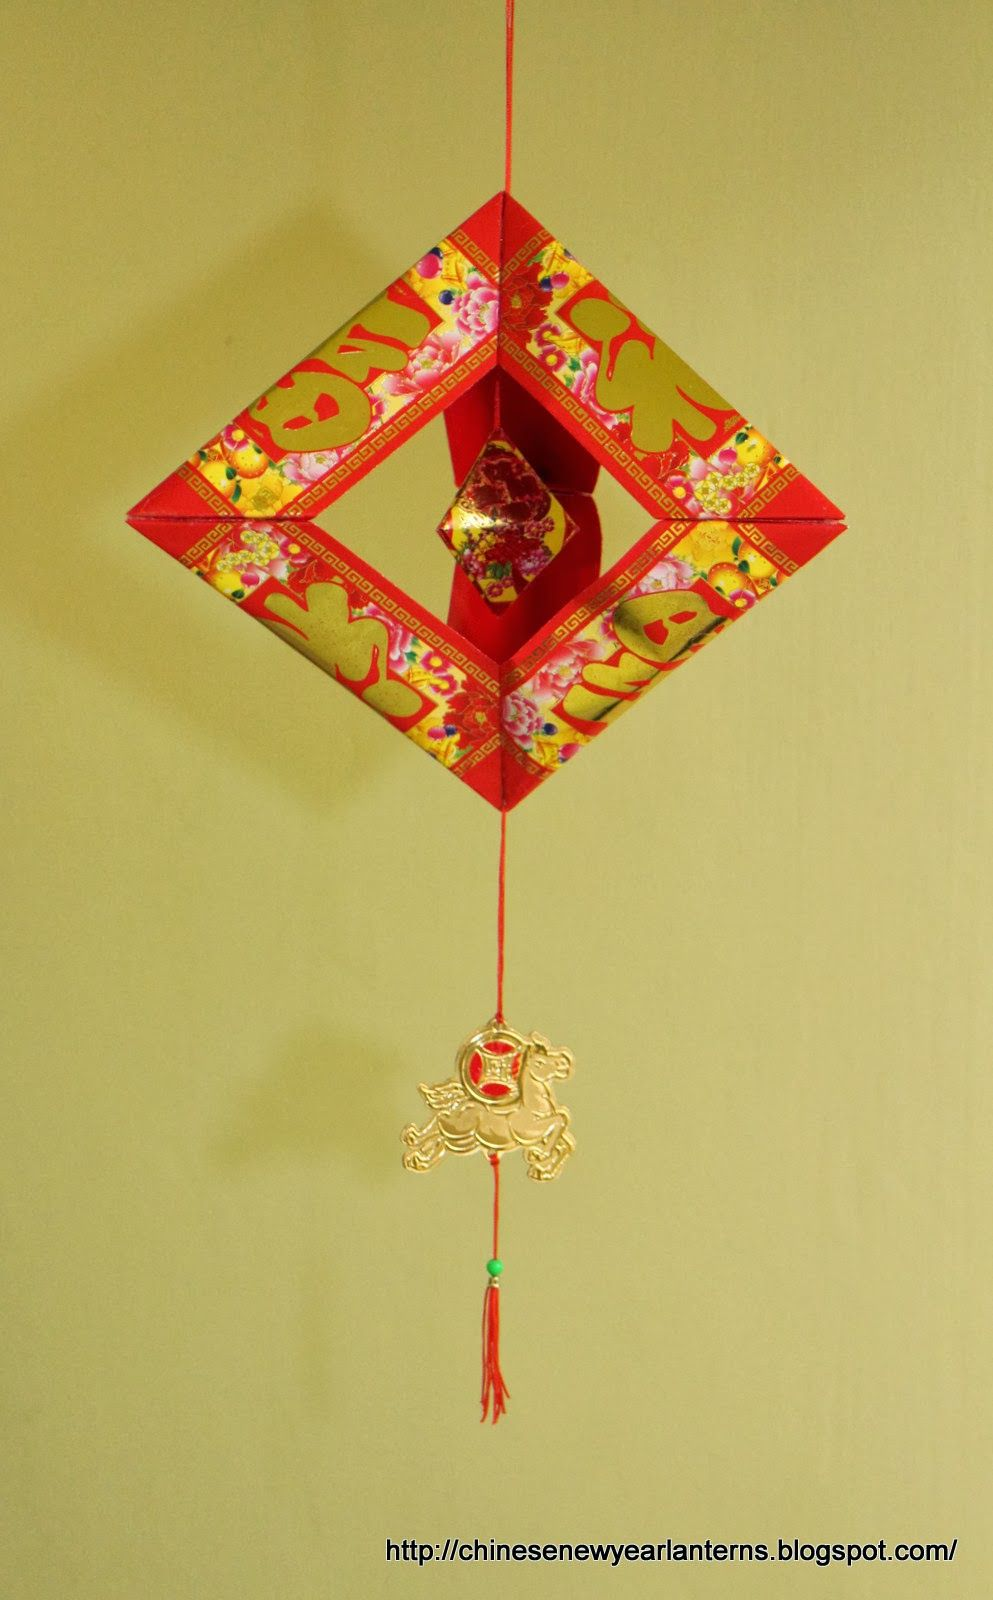 Chinese New Year Lanterns 红包灯笼手工制作 How to make a